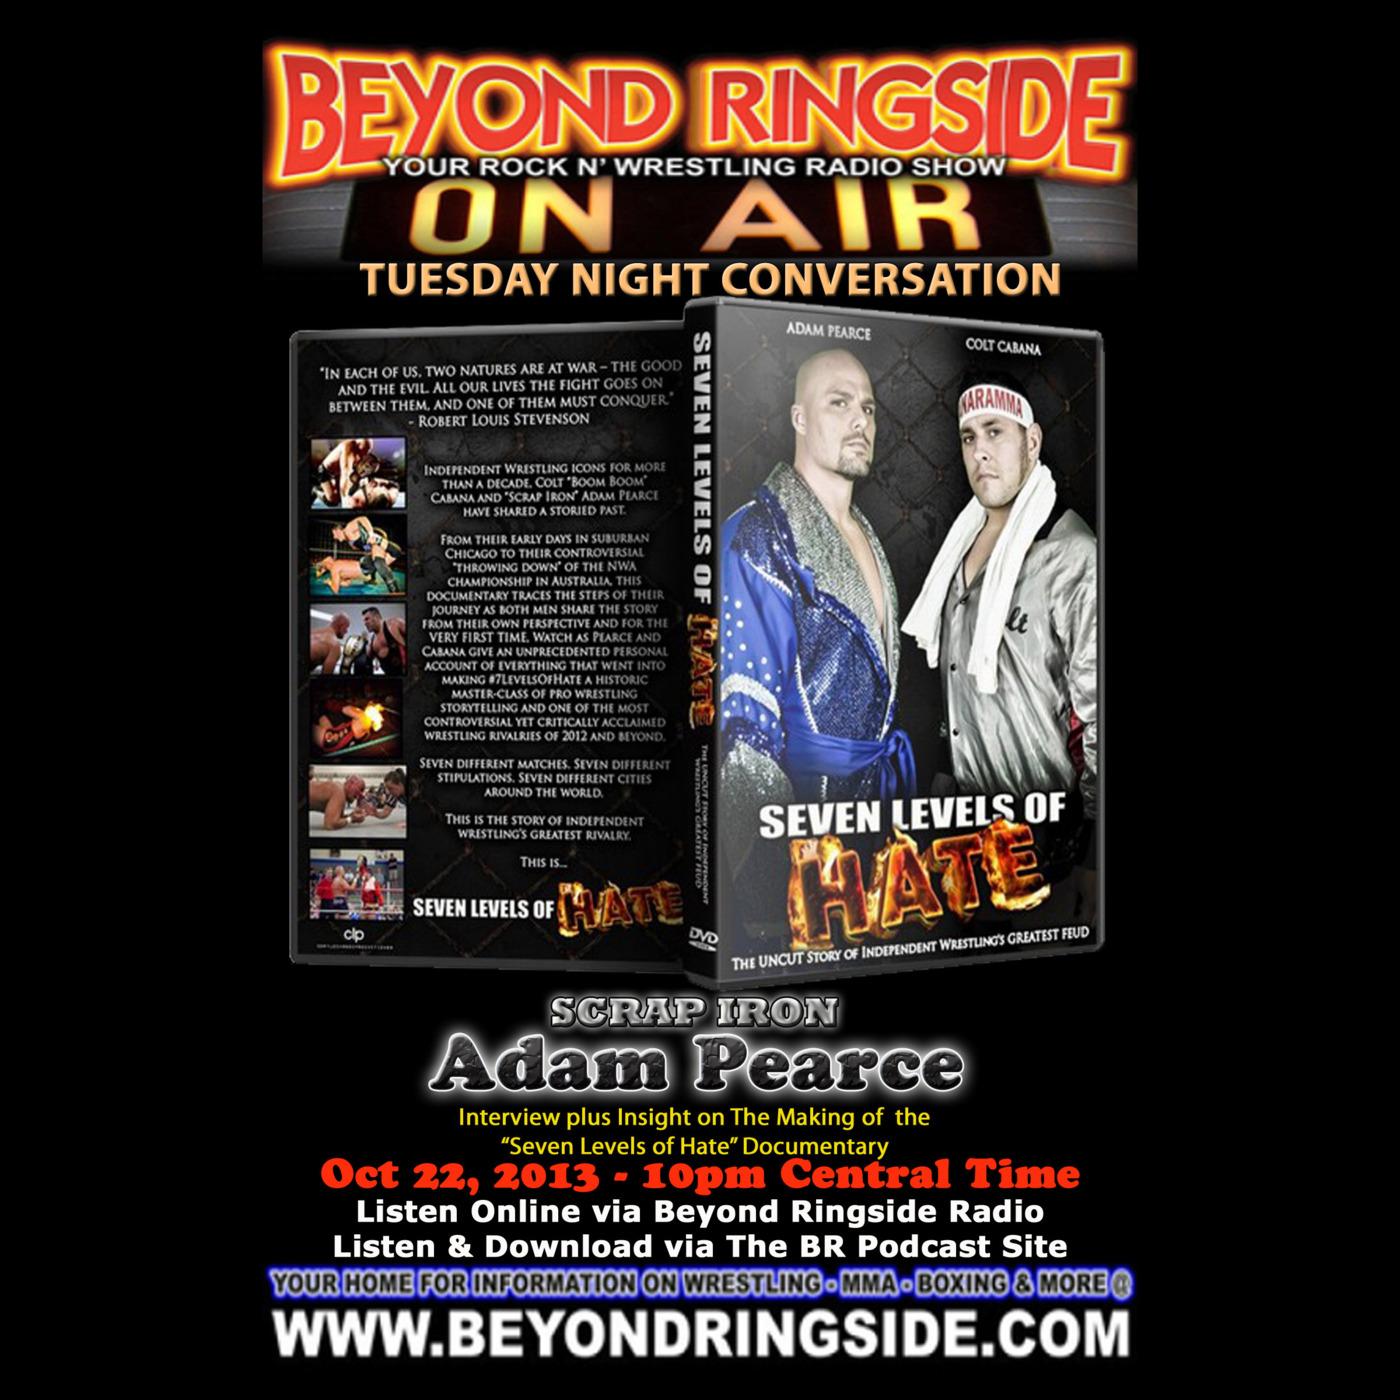 Beyond Ringside Podcast - Episode 266 - Adam Pearce / Seven